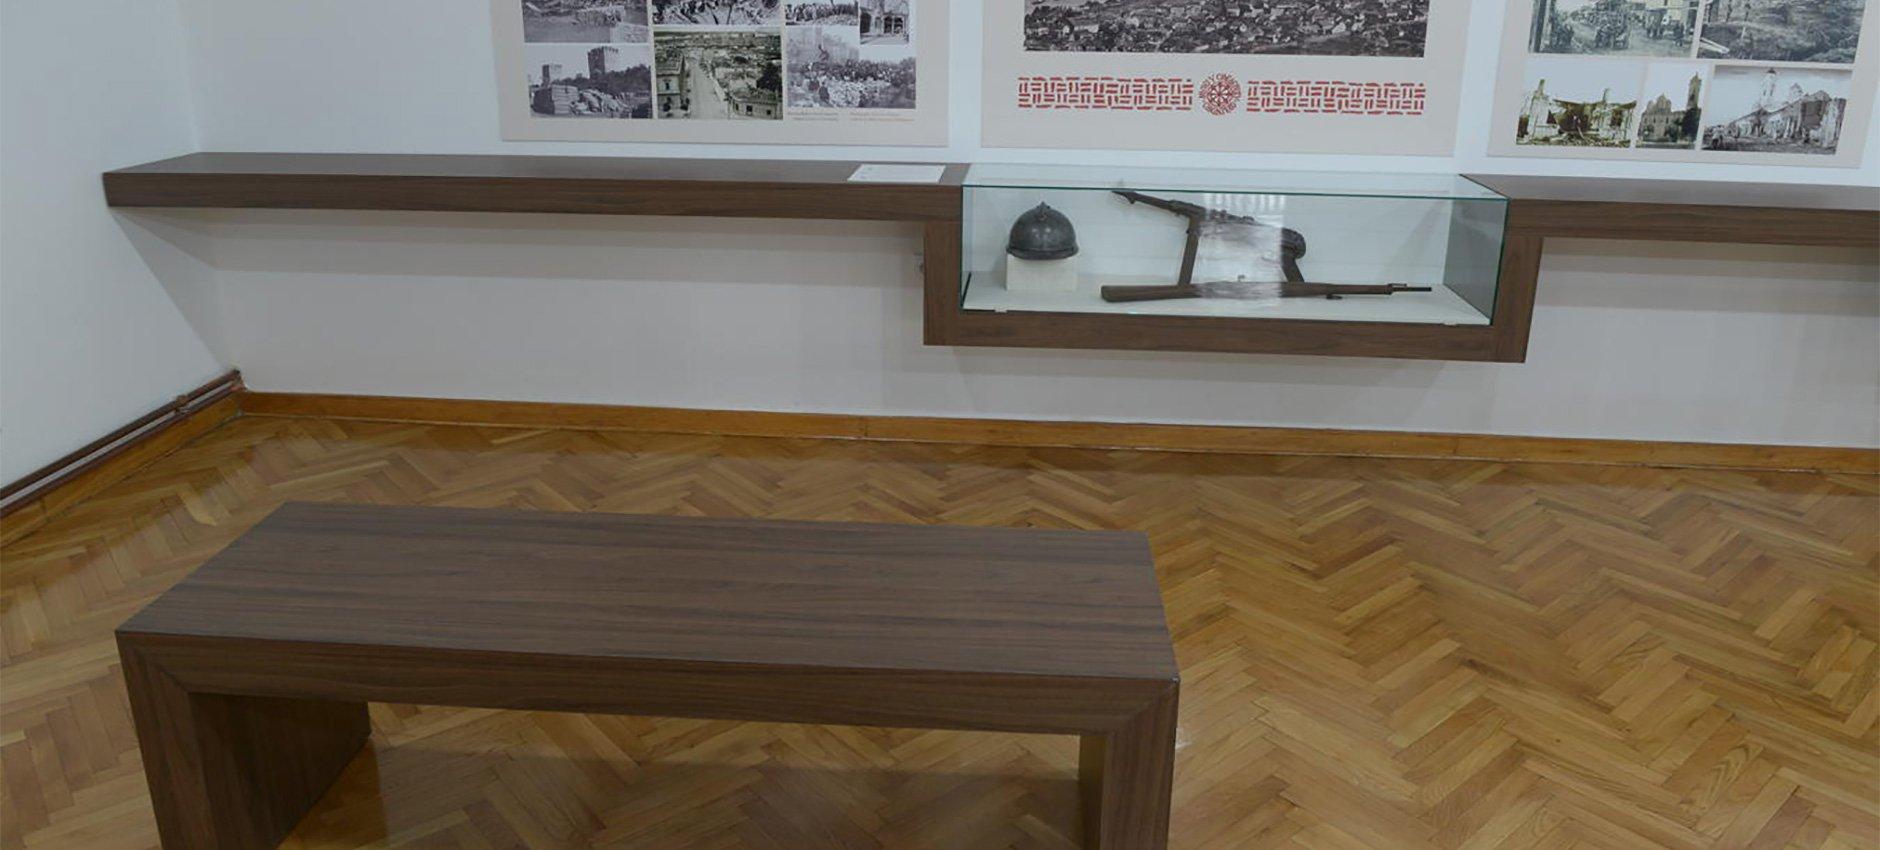 smederevo-muzej-7.jpg